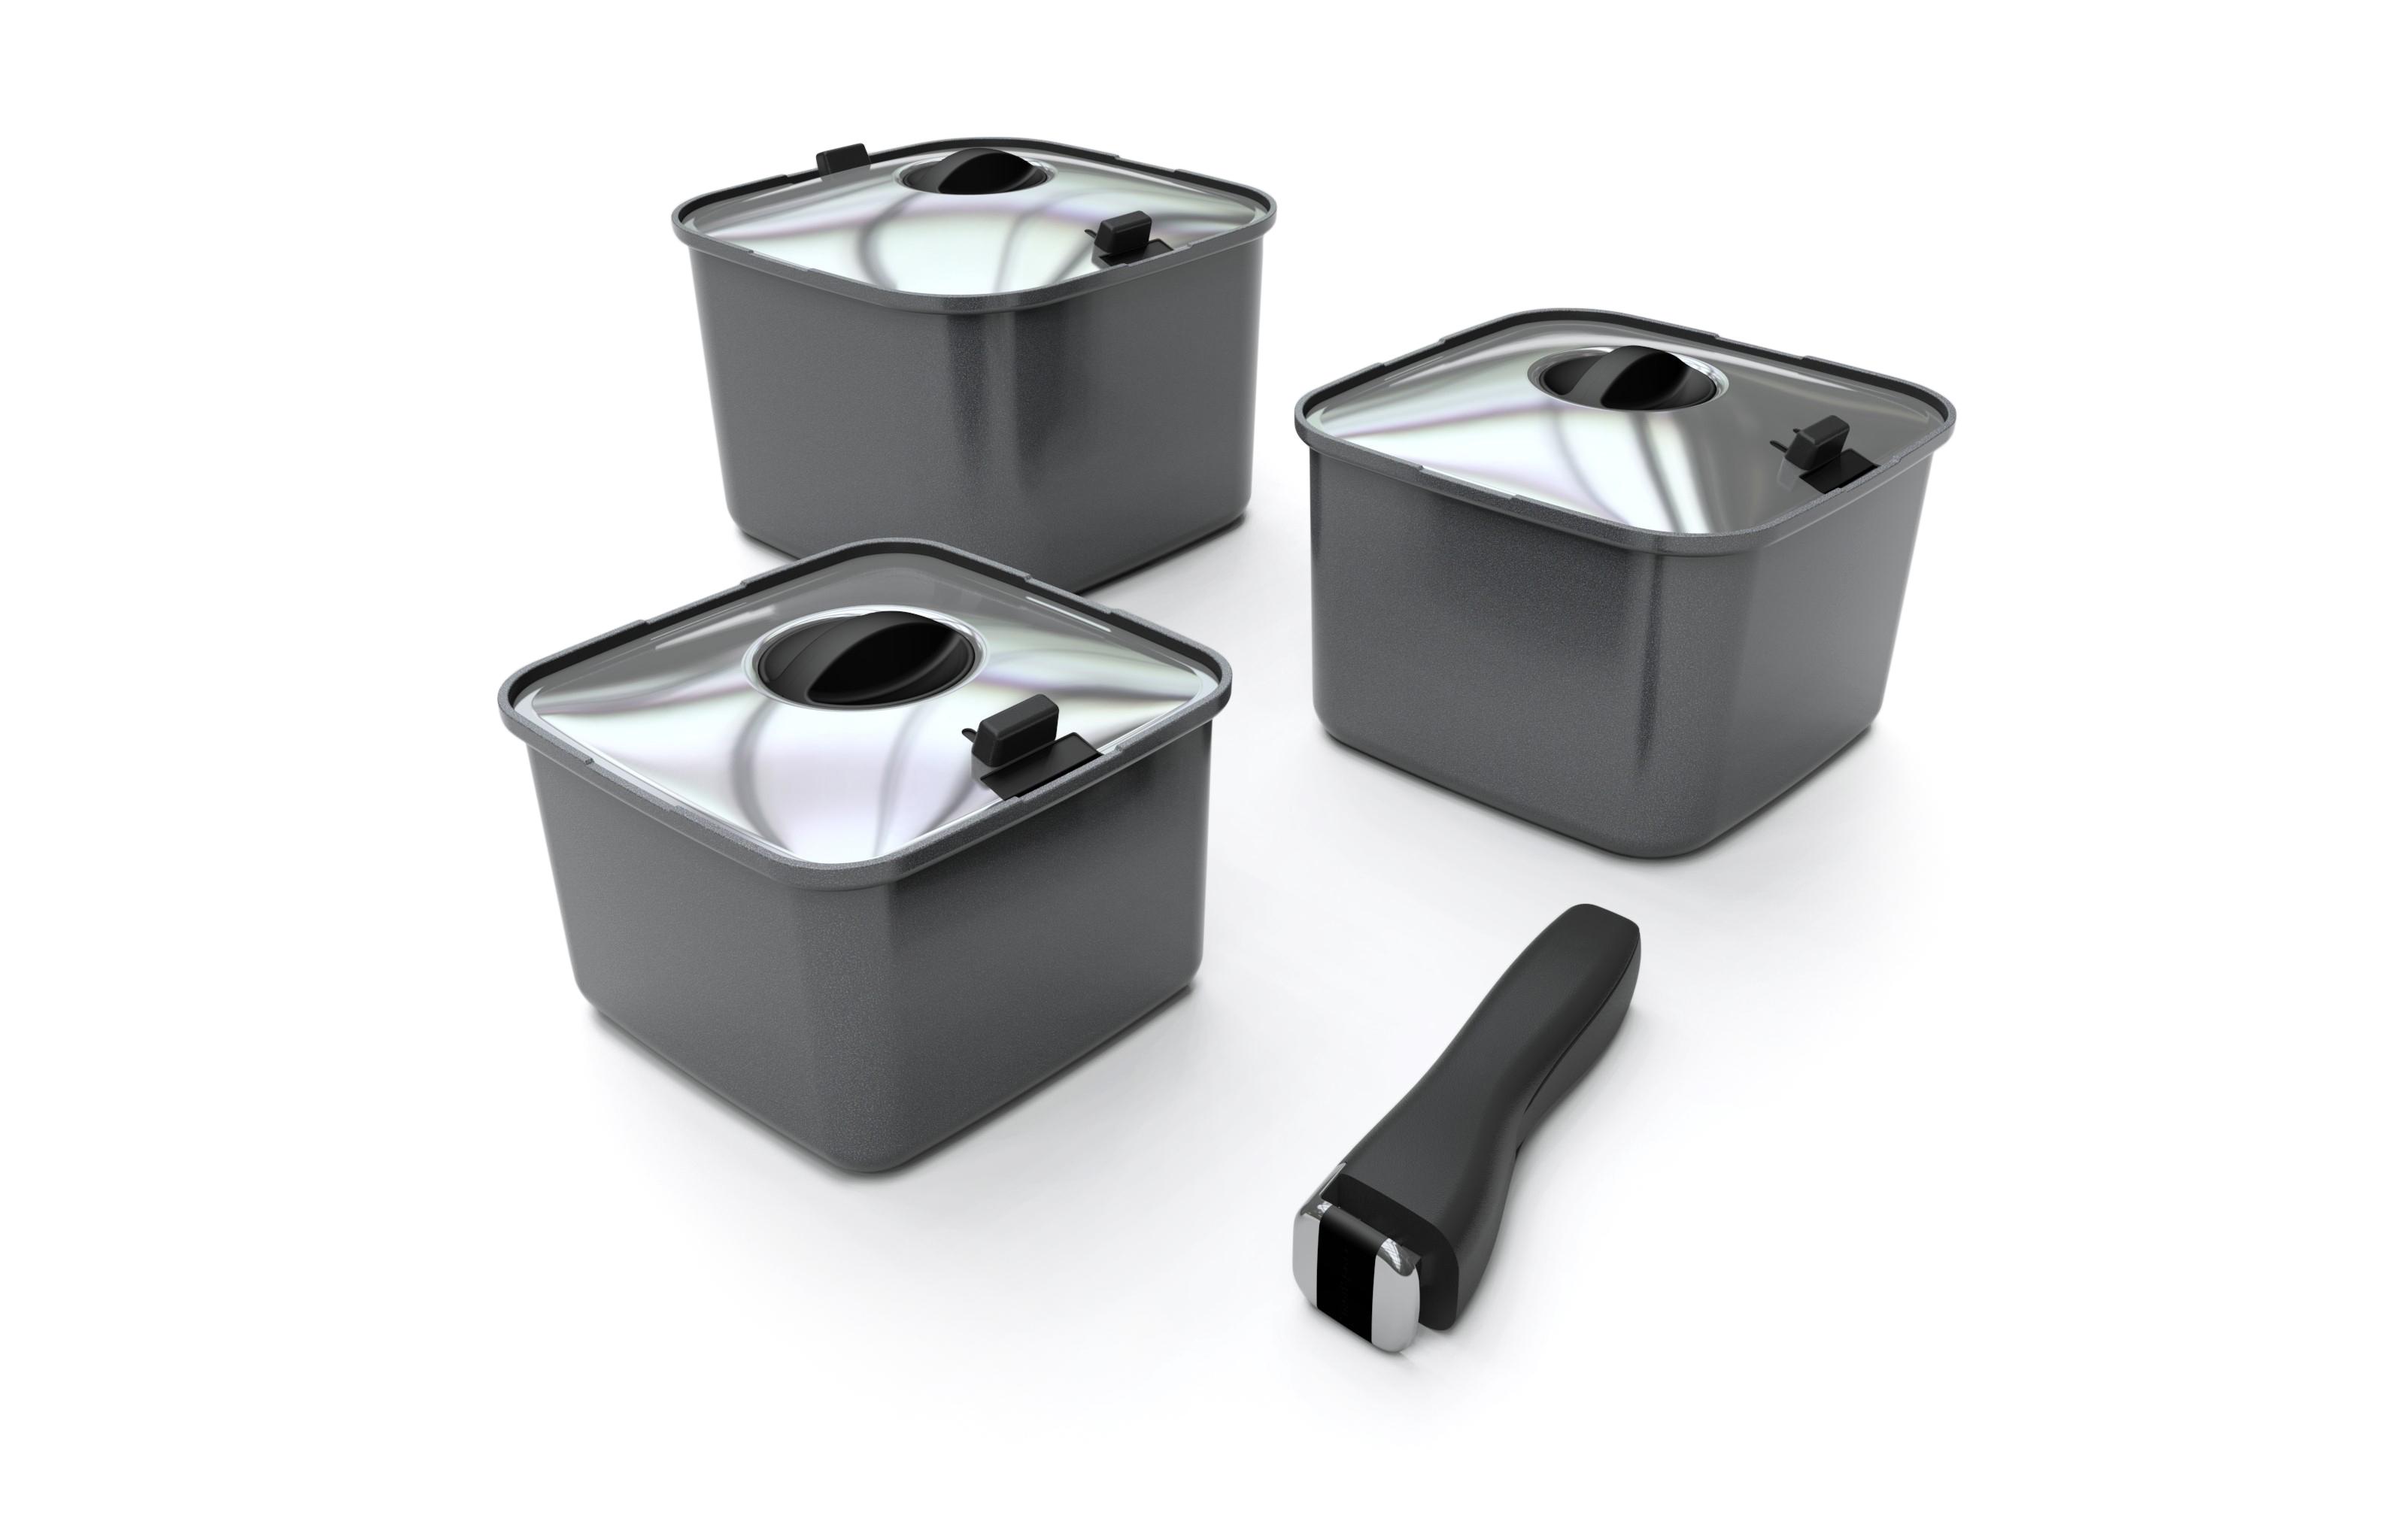 Smartspace square cooking pots info